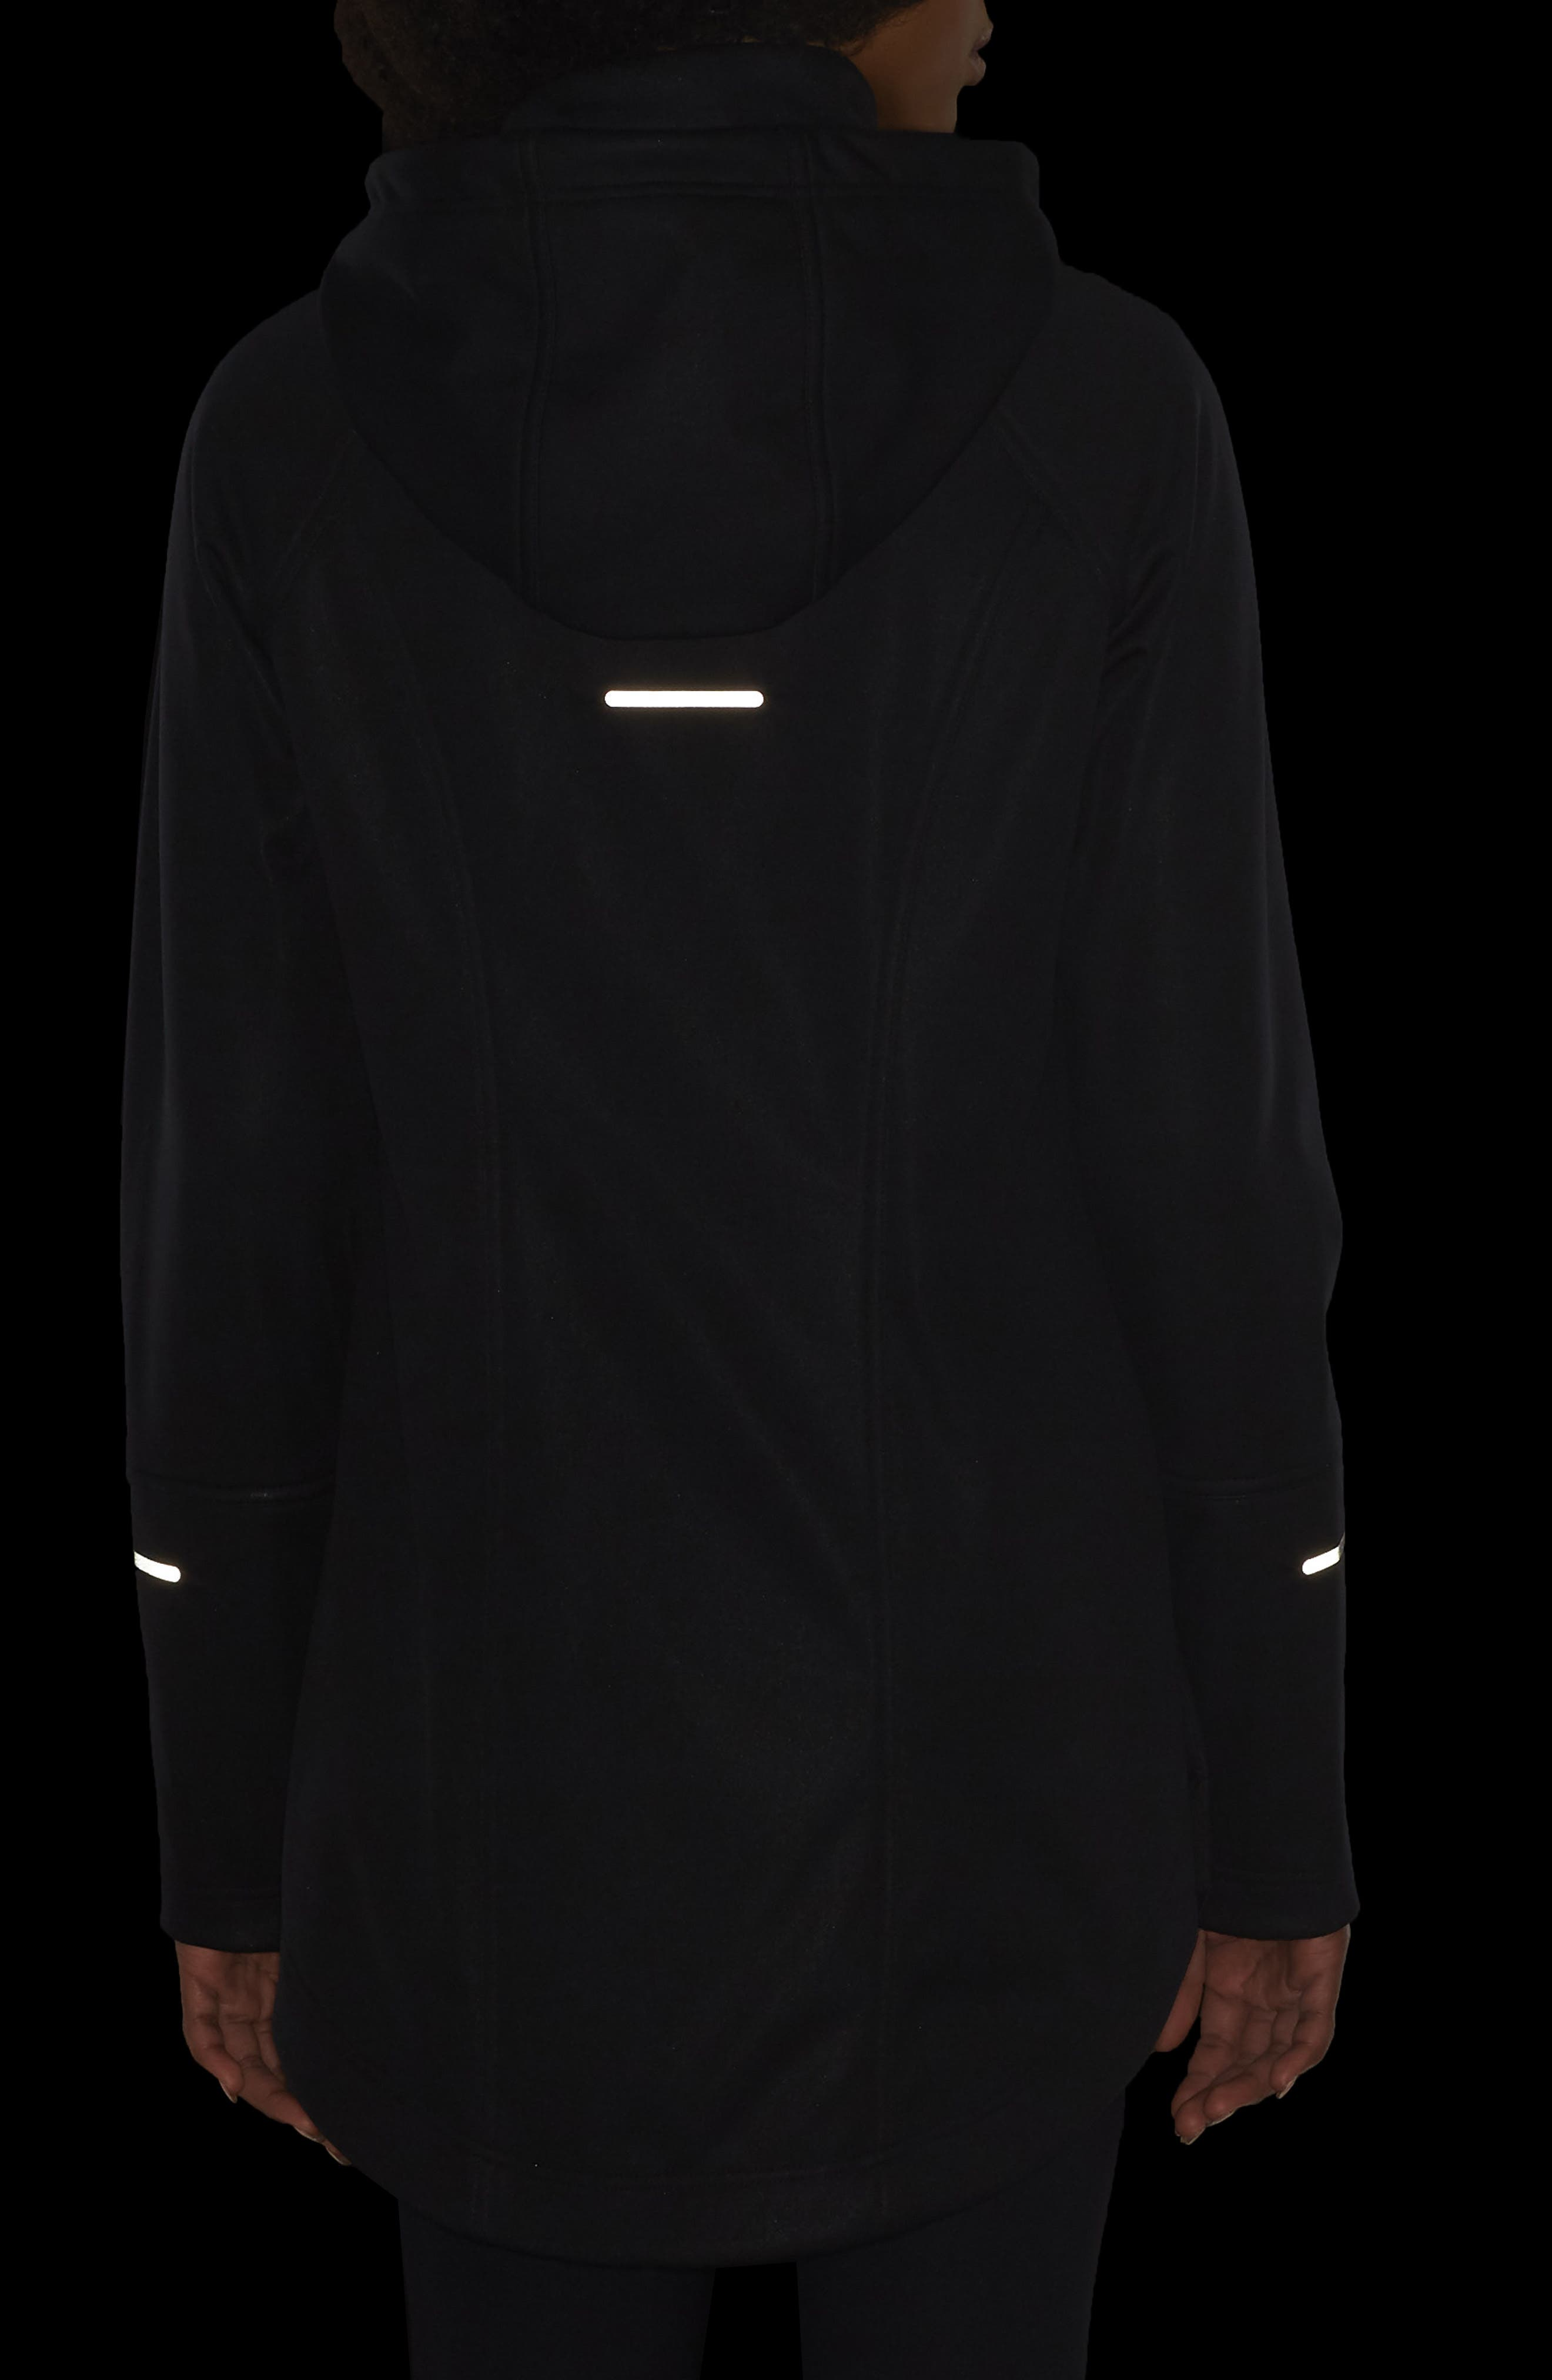 ZELLA, Aero Hooded Soft Shell Training Jacket, Alternate thumbnail 5, color, 001